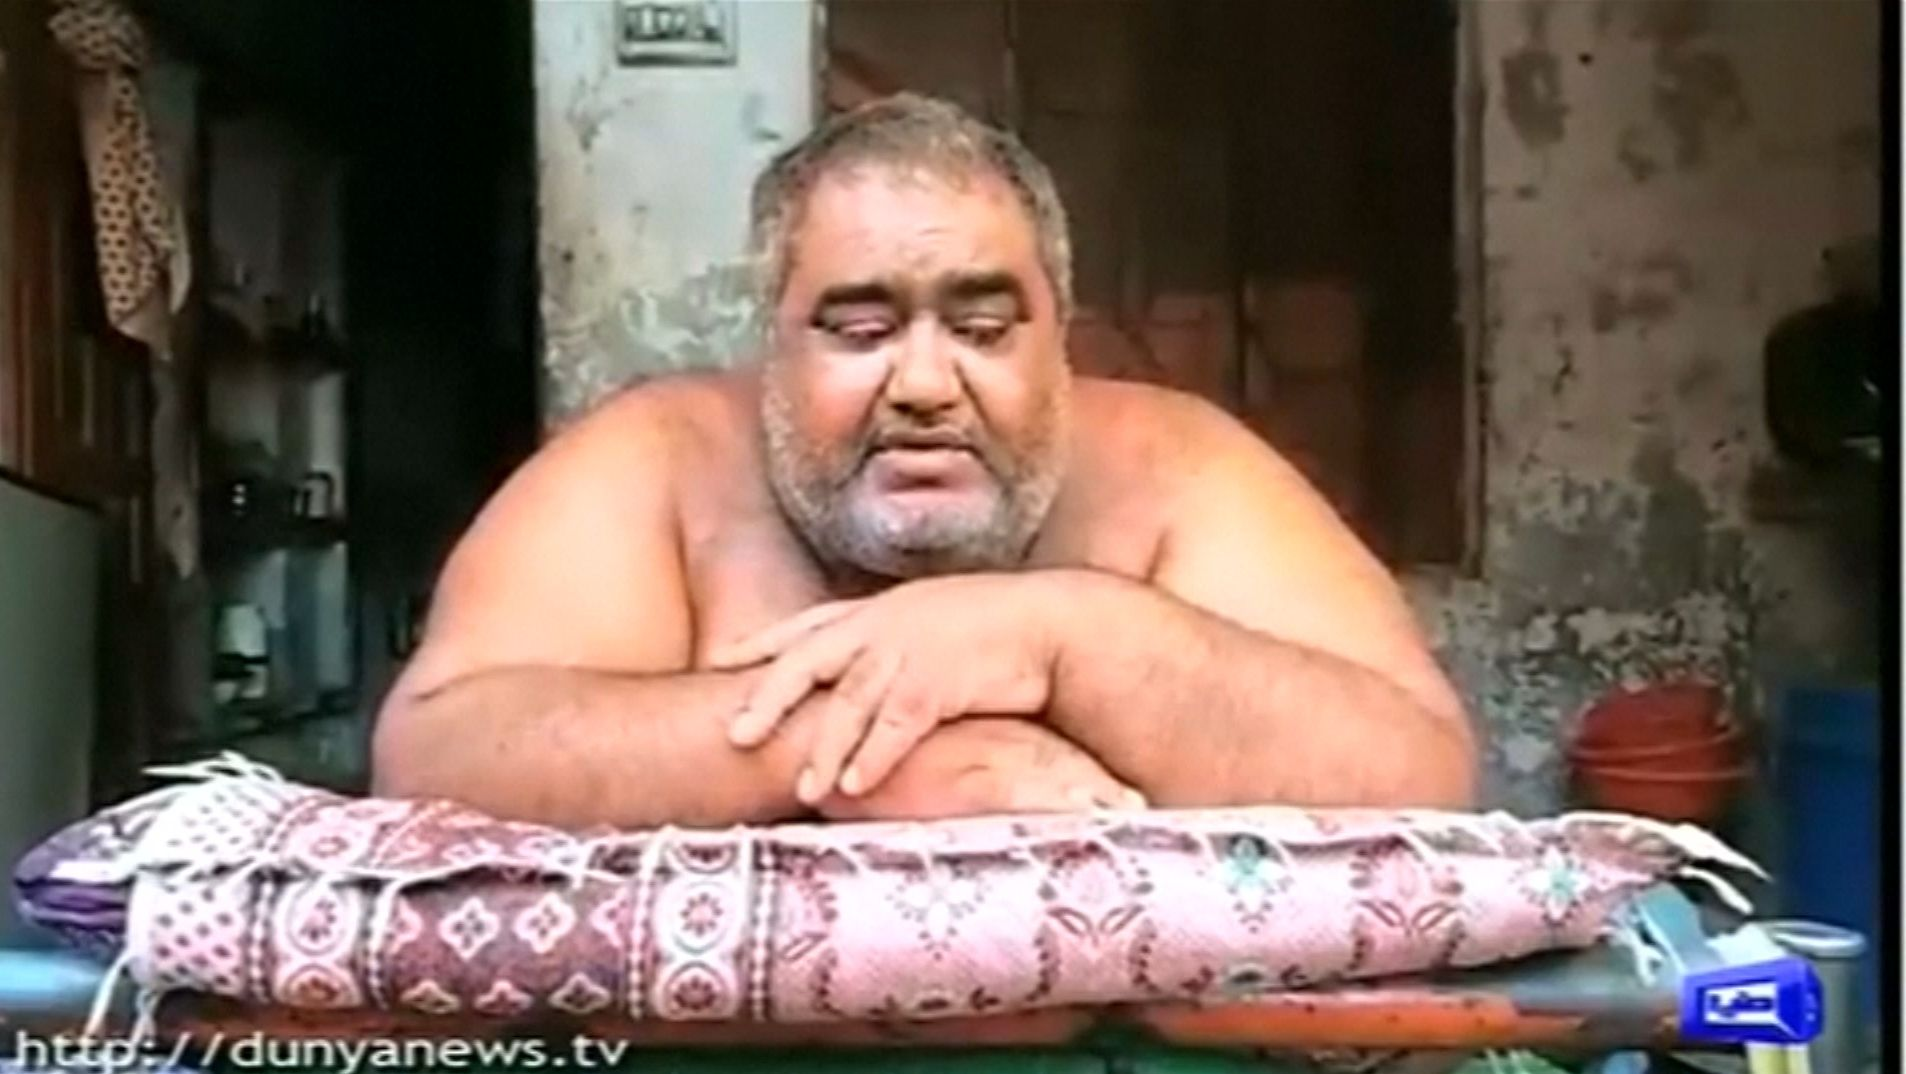 Der Pakistaner Noor Hasan wiegt 330 Kilogramm.